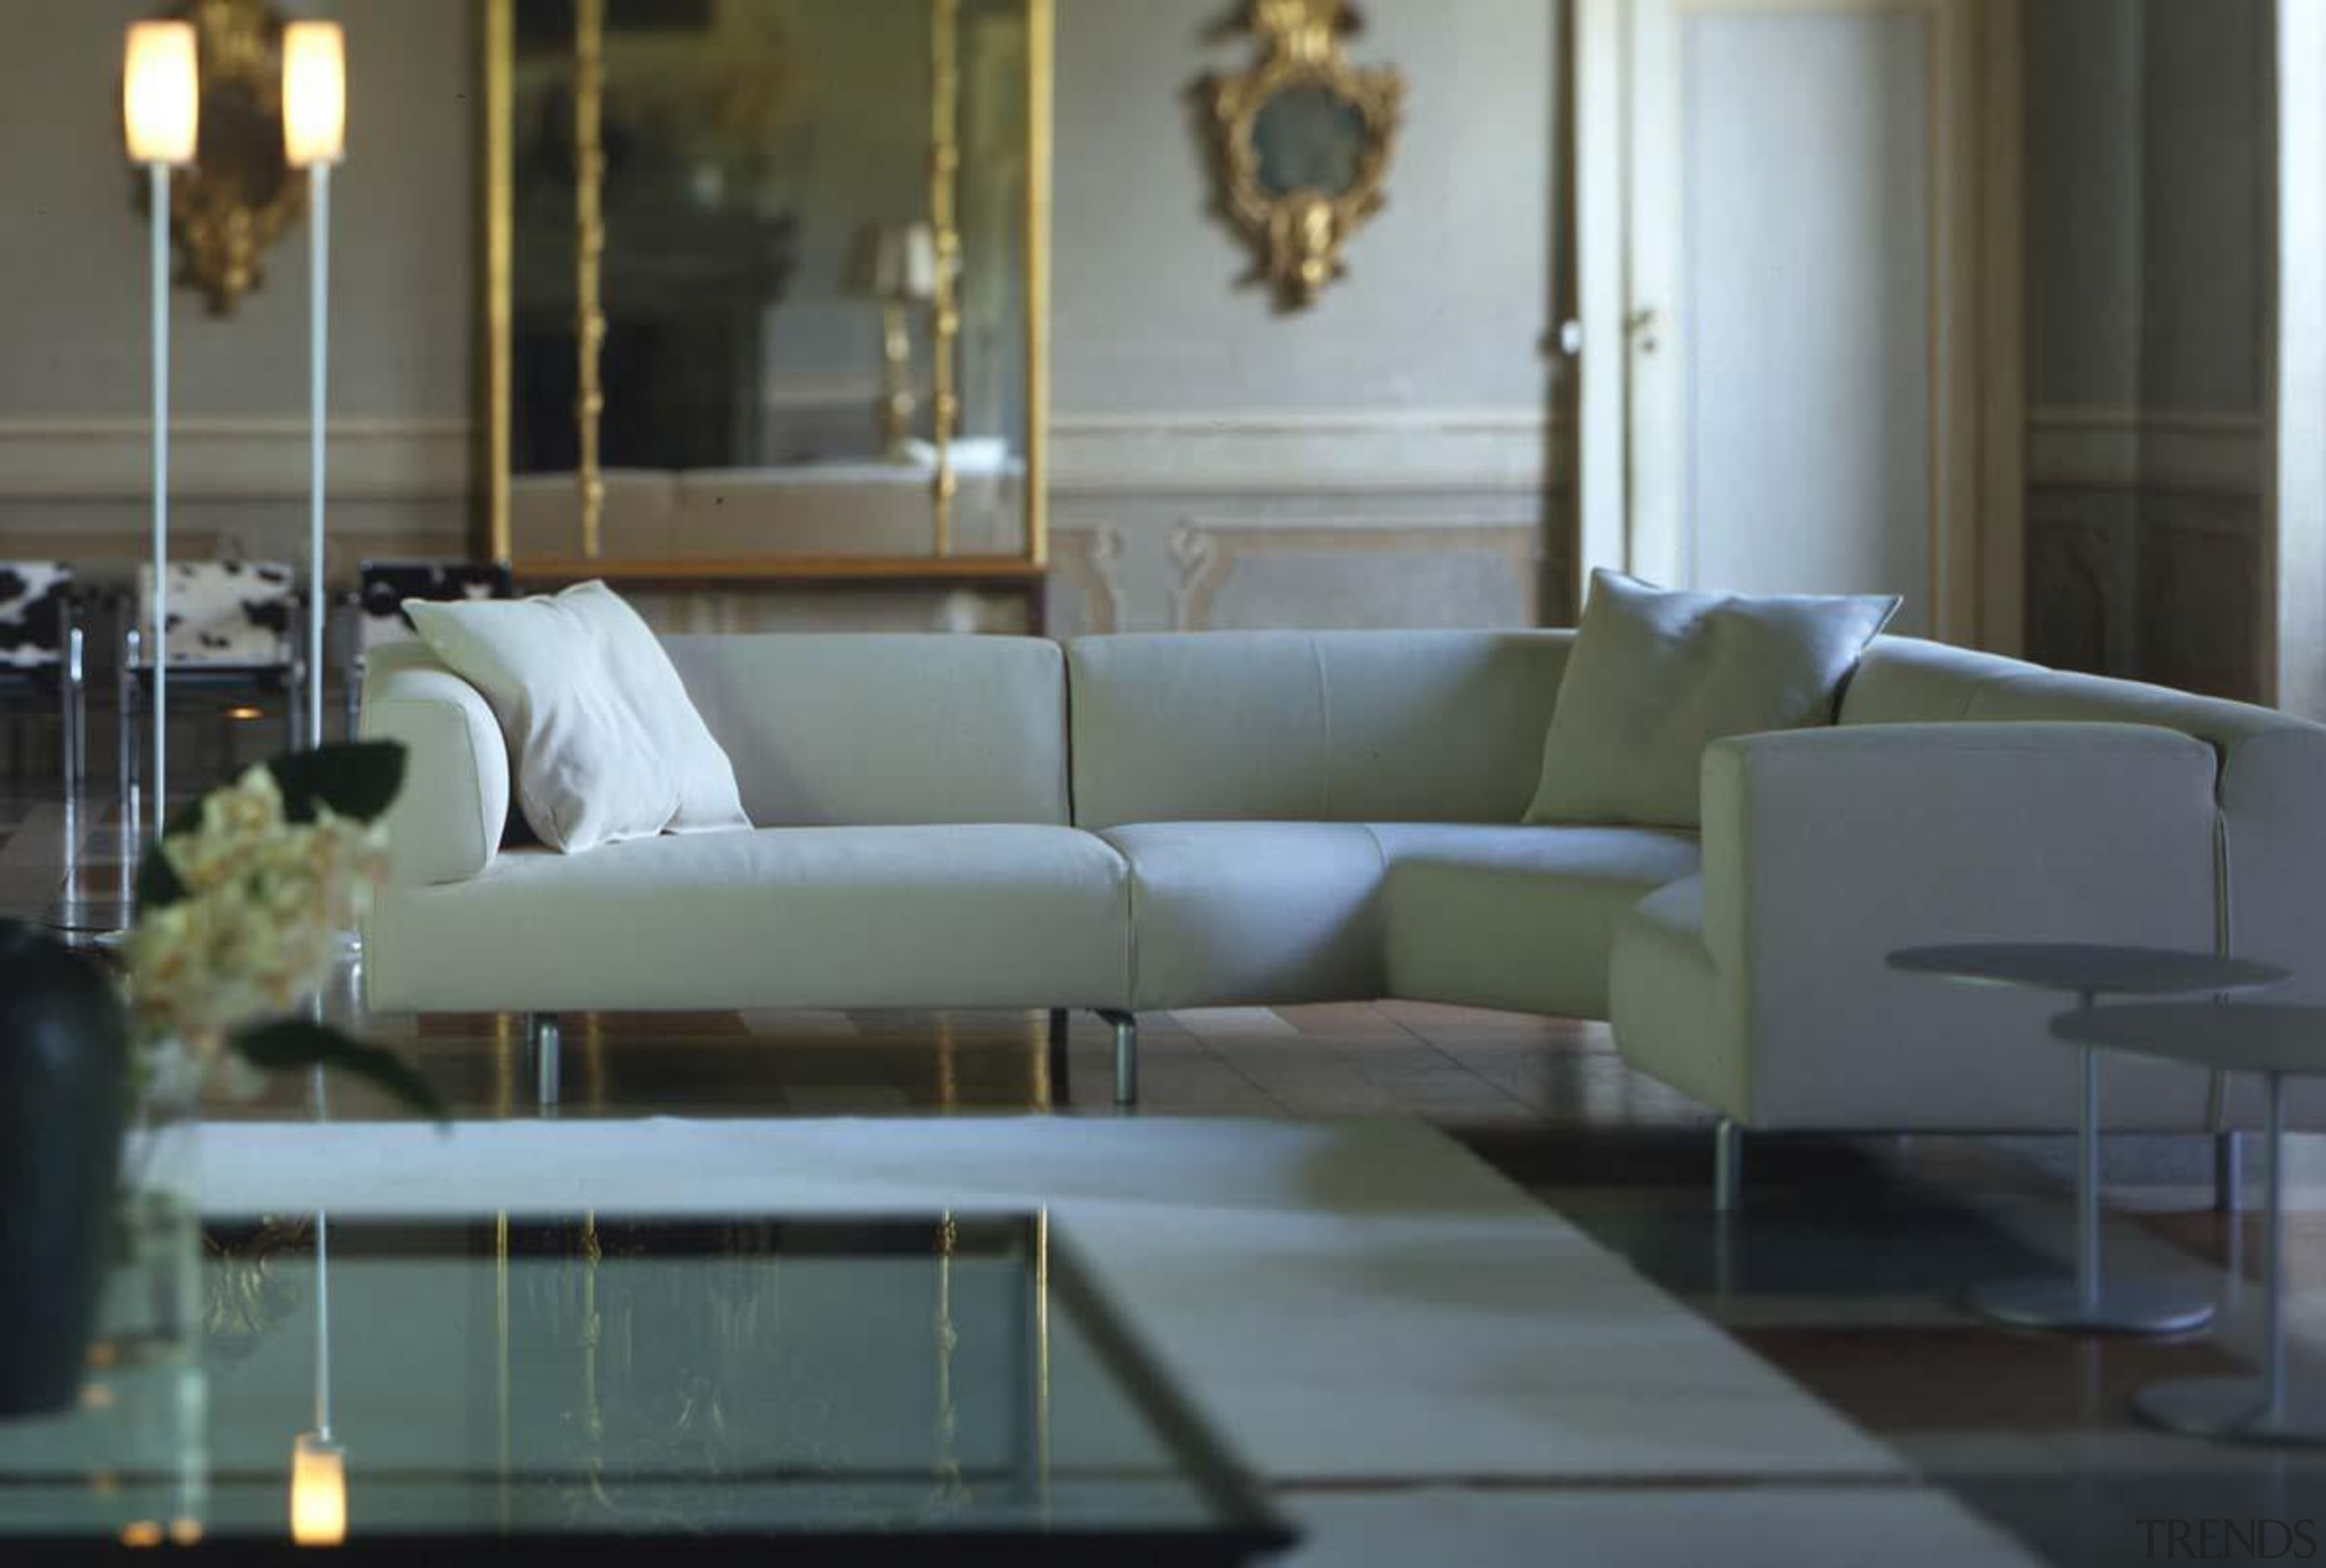 cassinalissonimetsofainstu6.jpg - cassinalissonimetsofainstu6.jpg - chair | coffee table chair, coffee table, couch, floor, flooring, furniture, home, interior design, living room, lobby, loveseat, room, table, gray, black